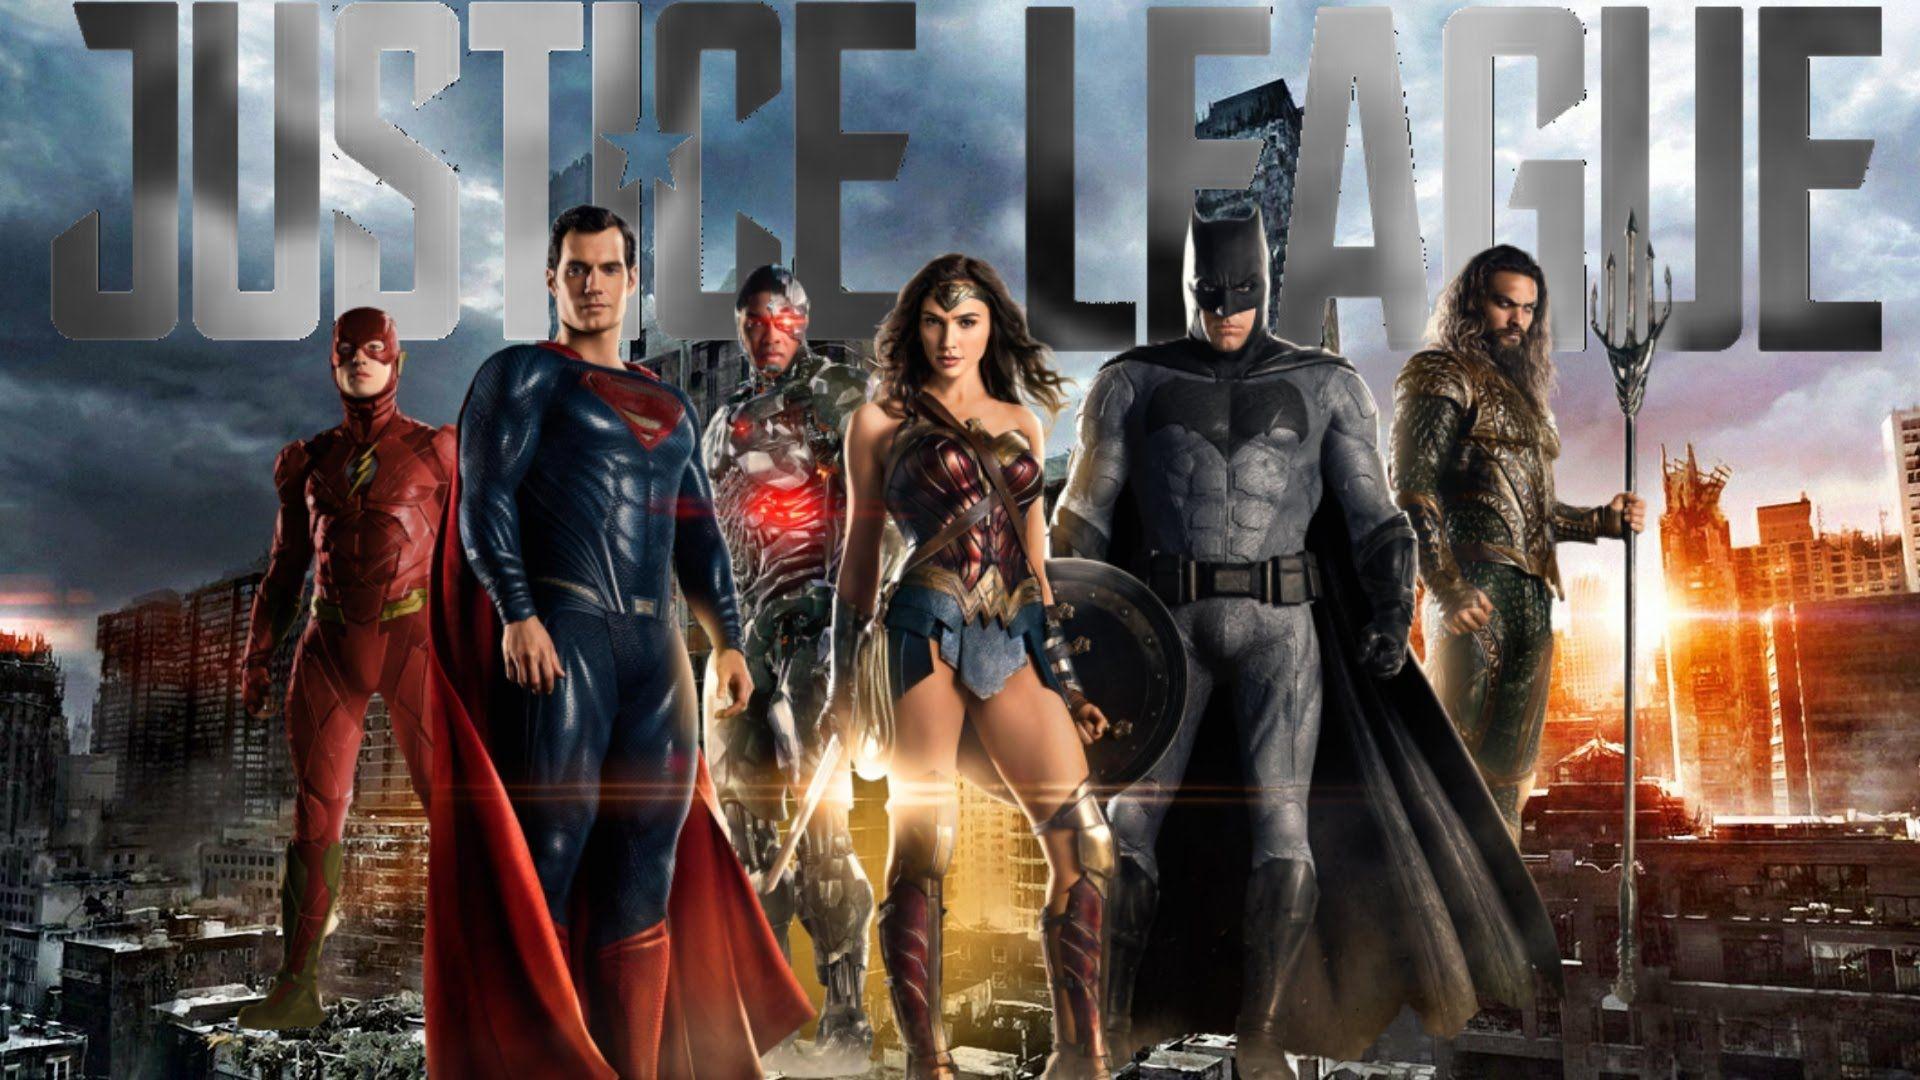 Cool Wallpaper Movie Justice League - 03103c79dace5b8a105f91f324f2559b  Photograph_725783.jpg